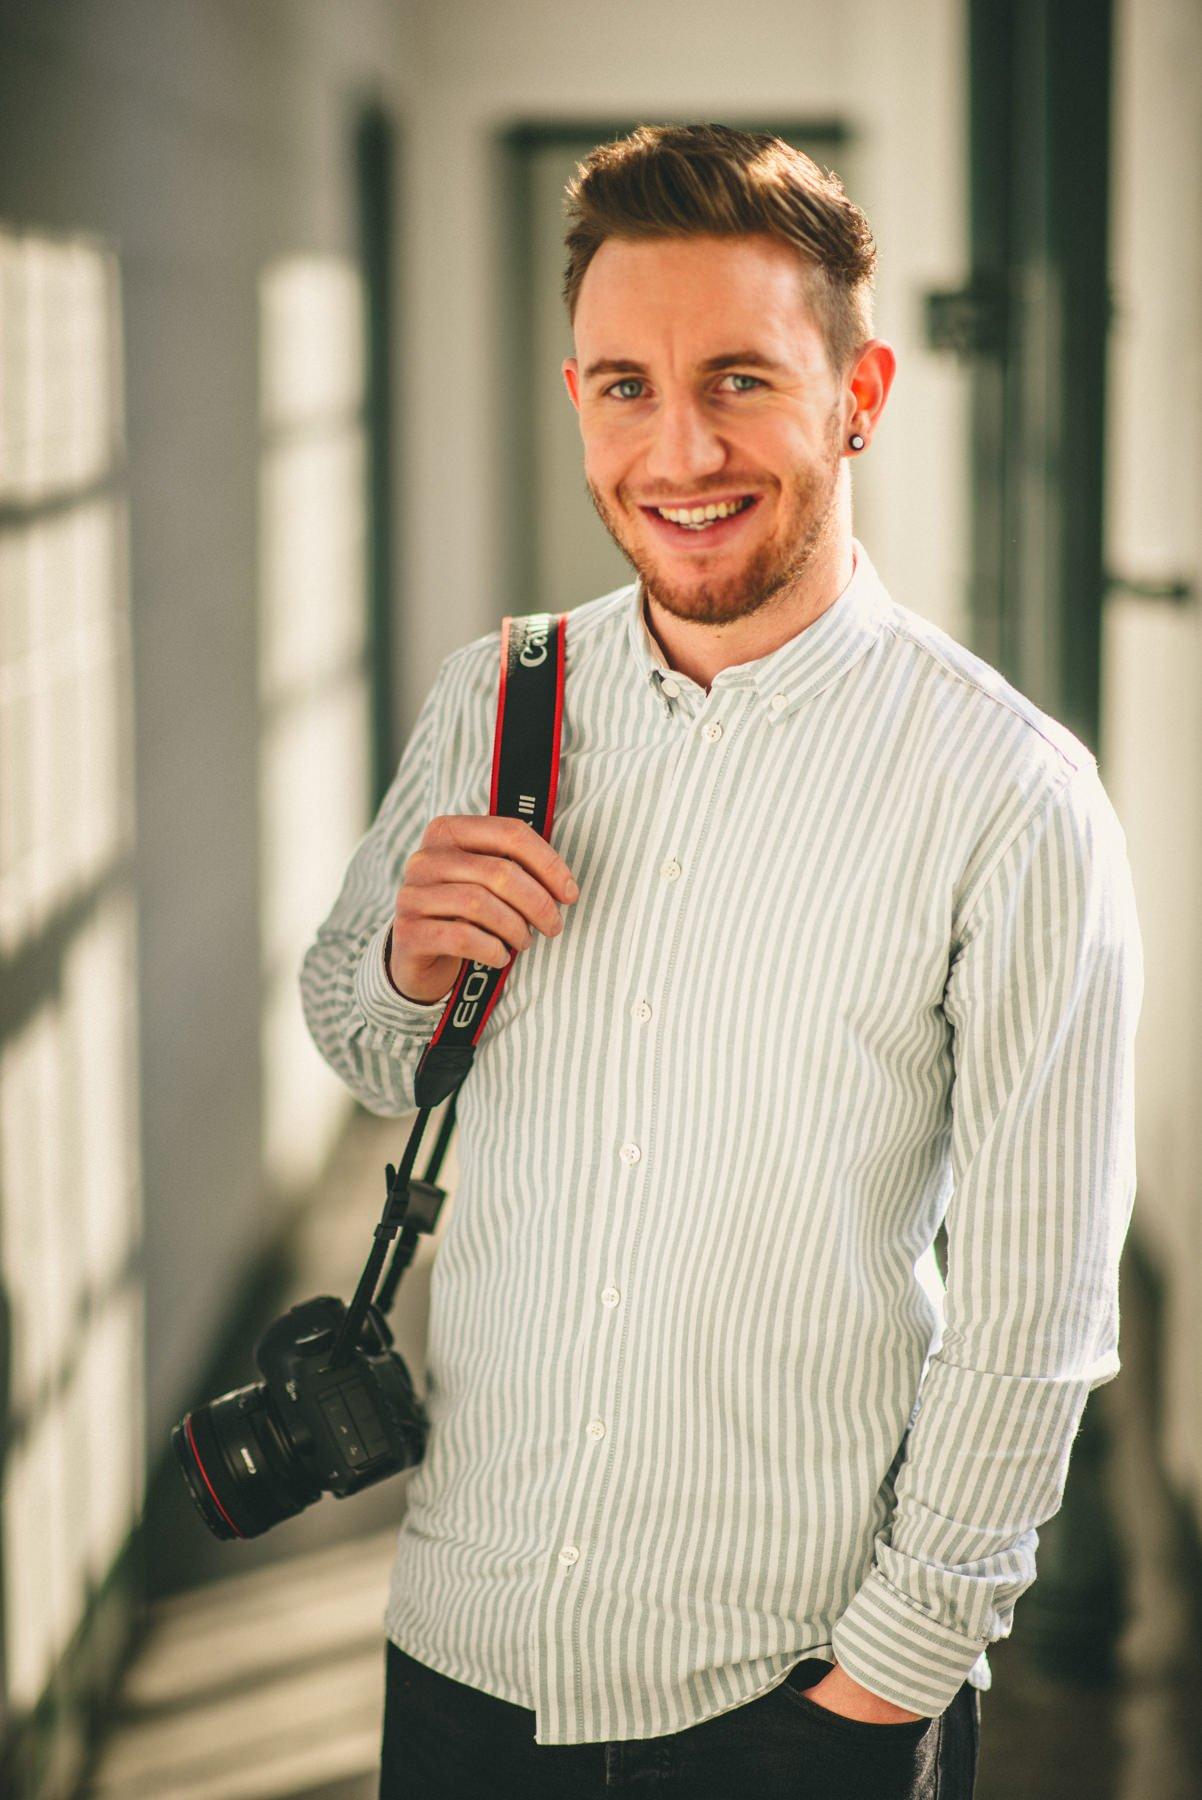 About Manchester Wedding Photographer Shane Webber